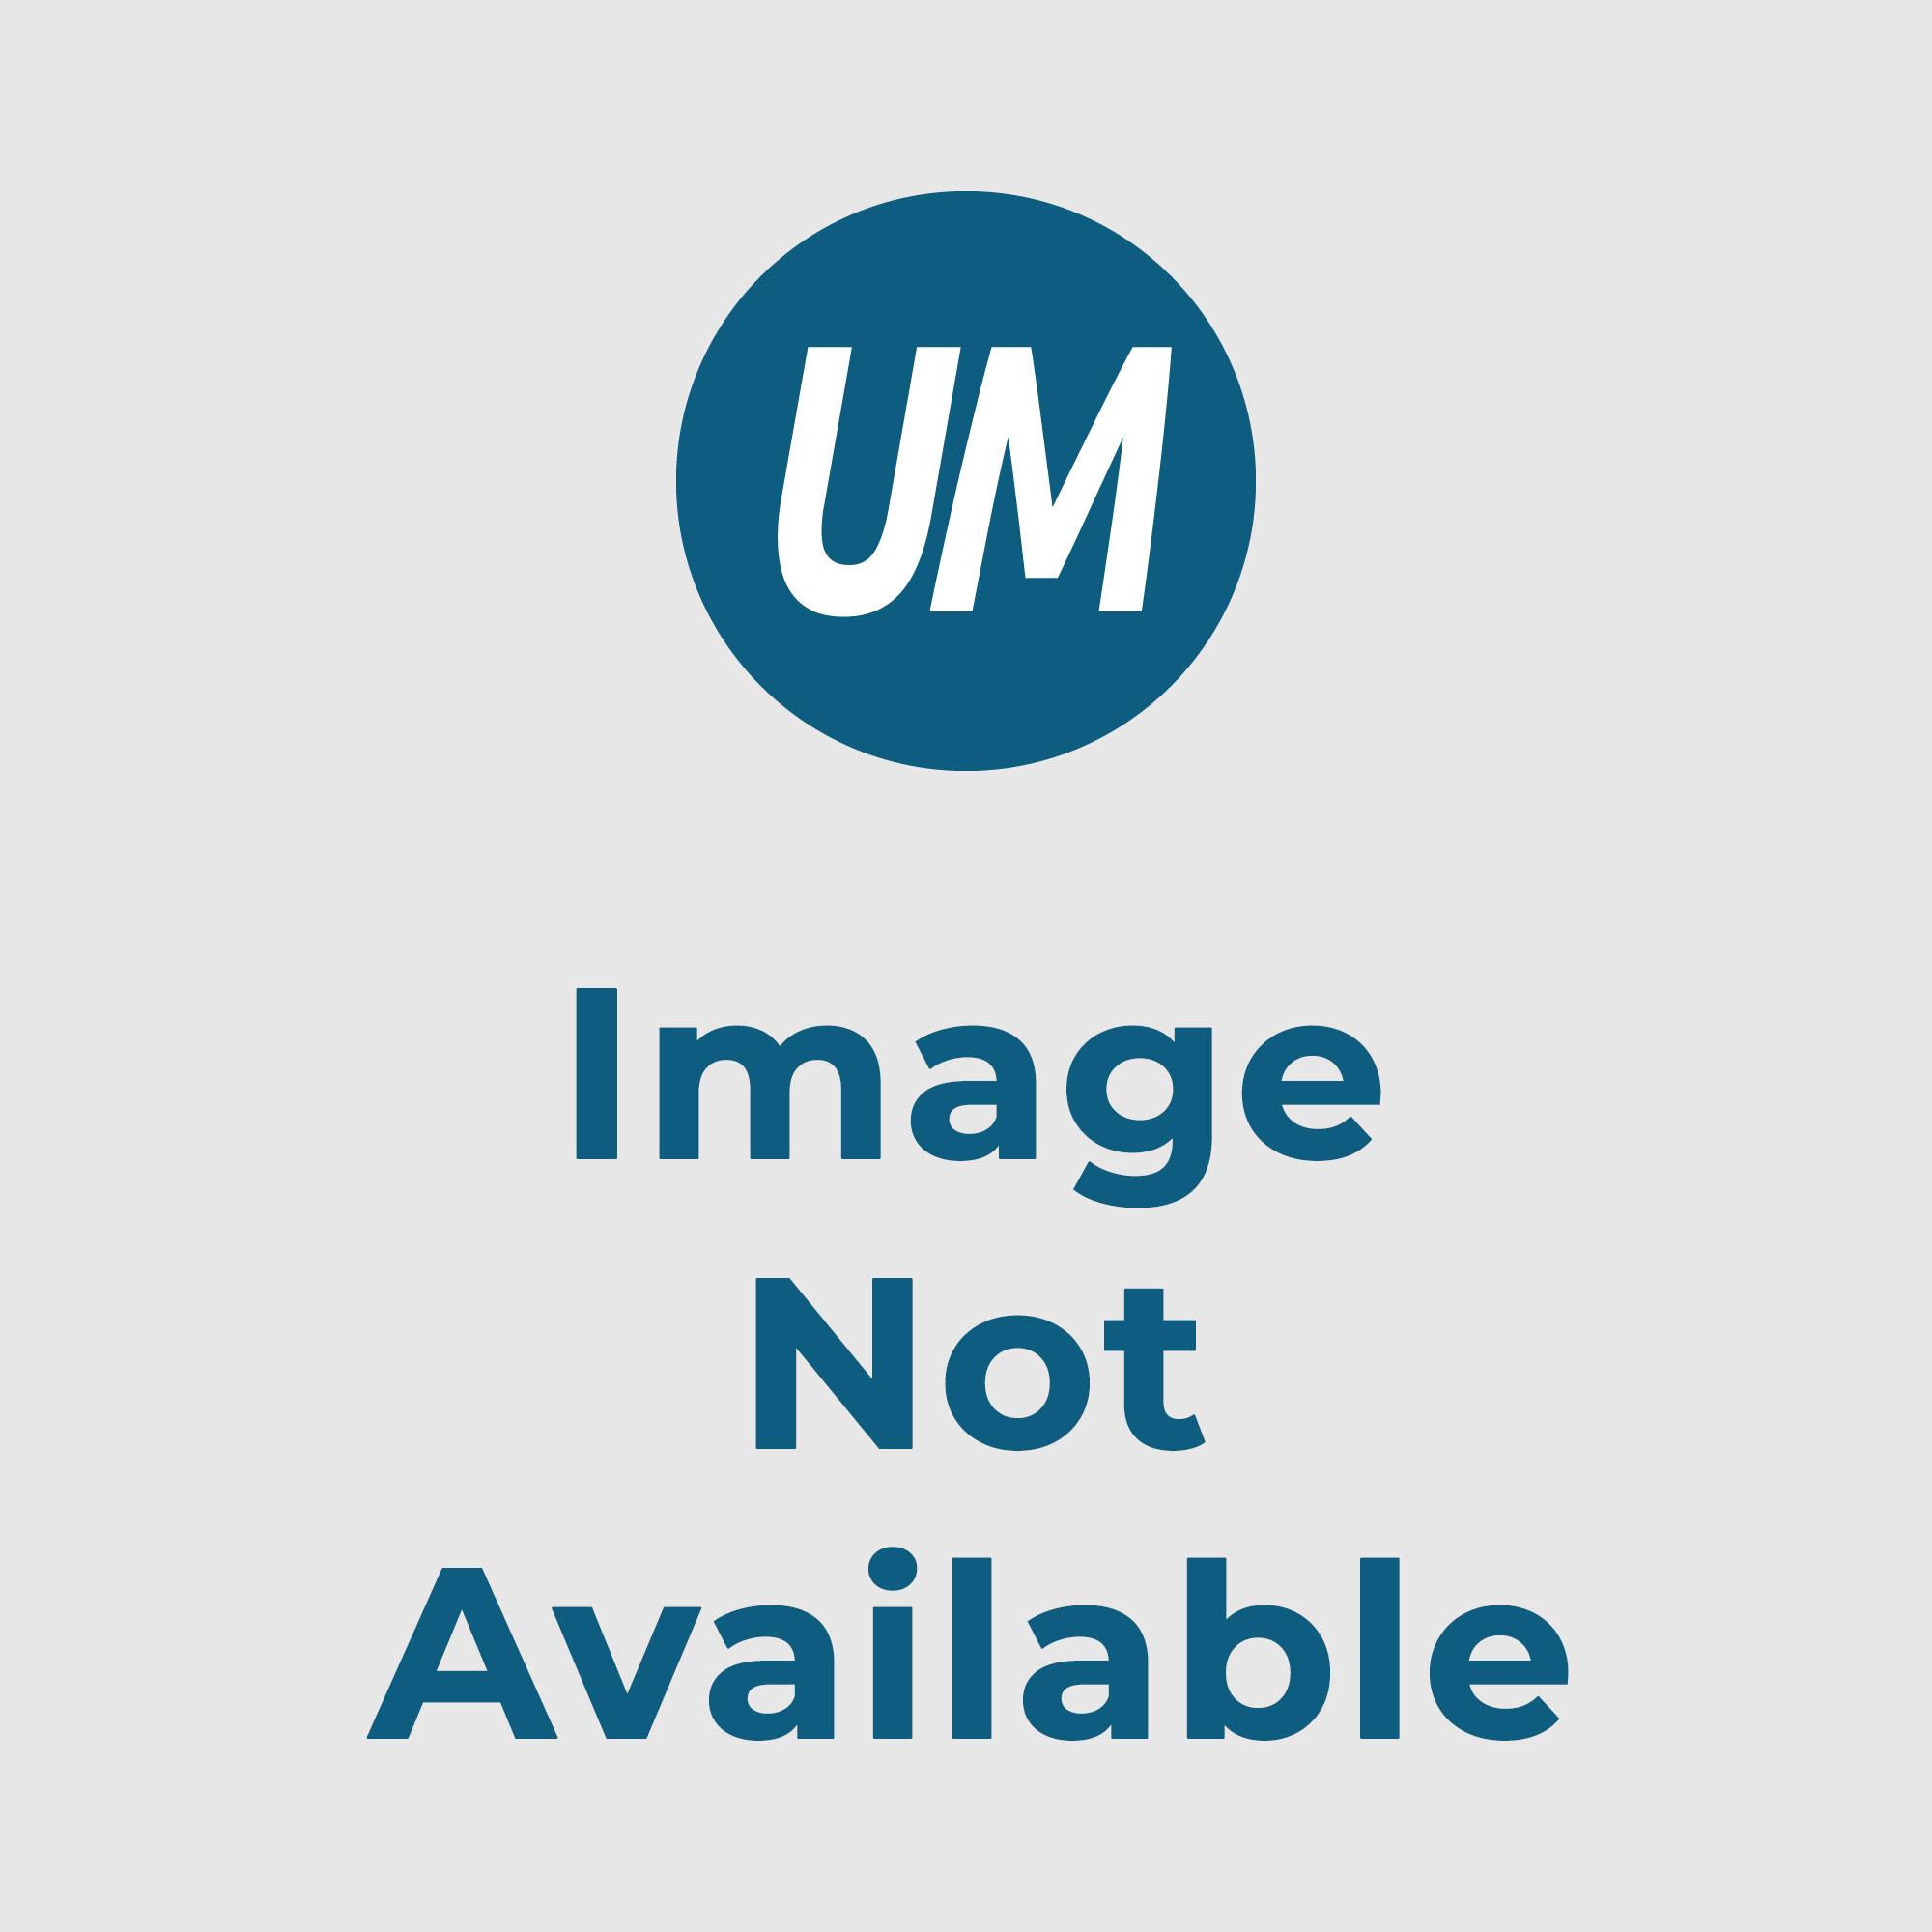 "HMO MUST OBTAIN PRIOR AUTHORIZATION Label - Size 1 1/2""W x 7/8""H"